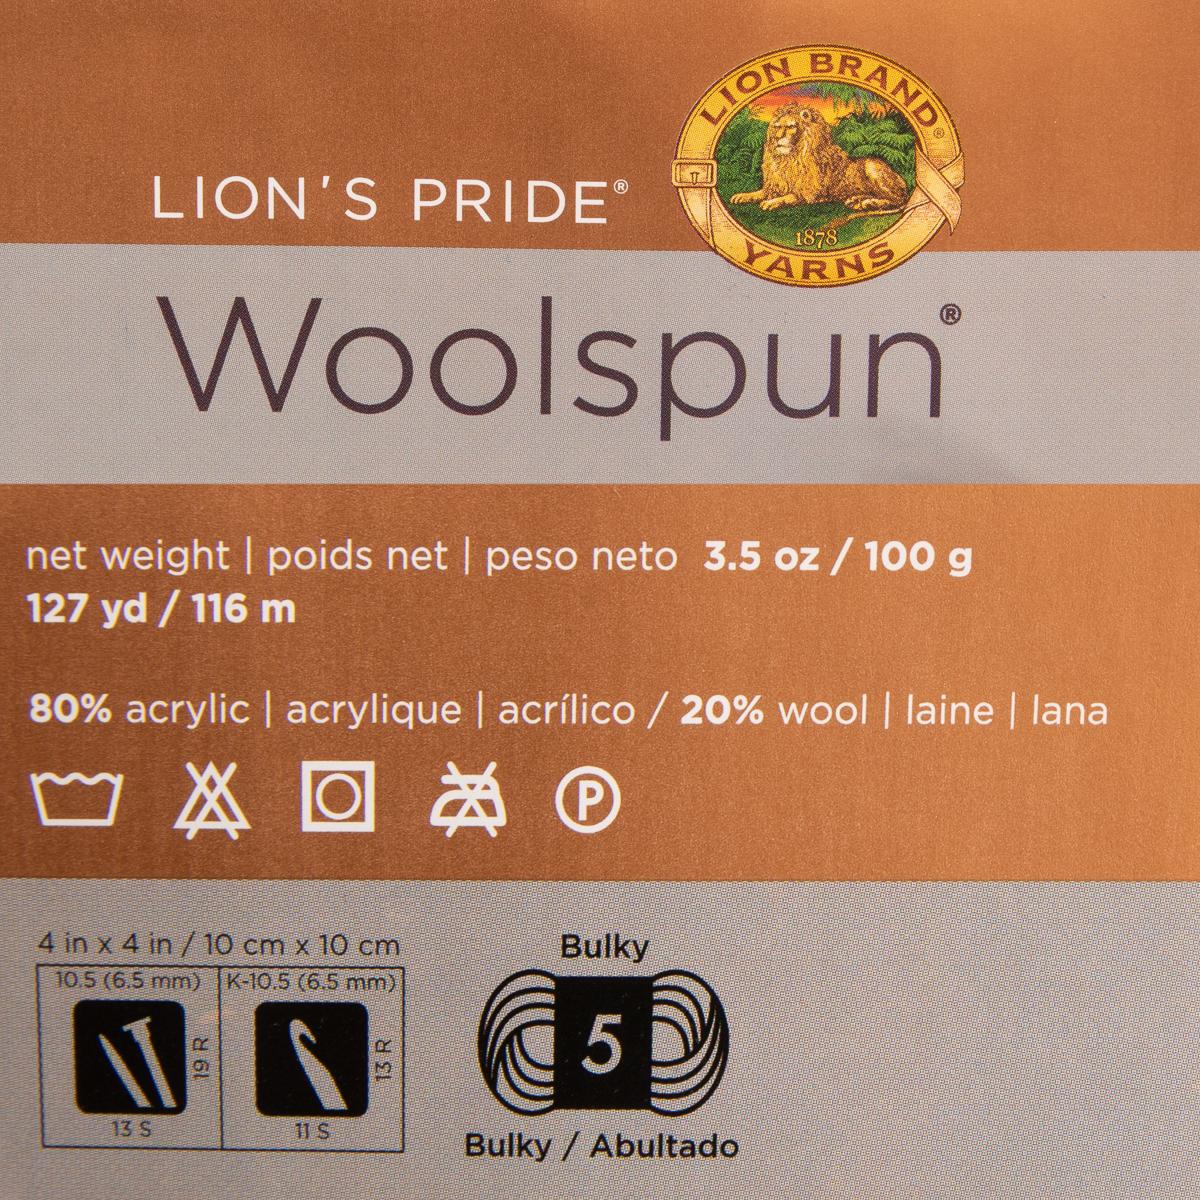 3pk-Lion-Brand-Woolspun-Acrylic-amp-Wool-Yarn-Bulky-5-Knit-Crocheting-Skeins-Soft thumbnail 16